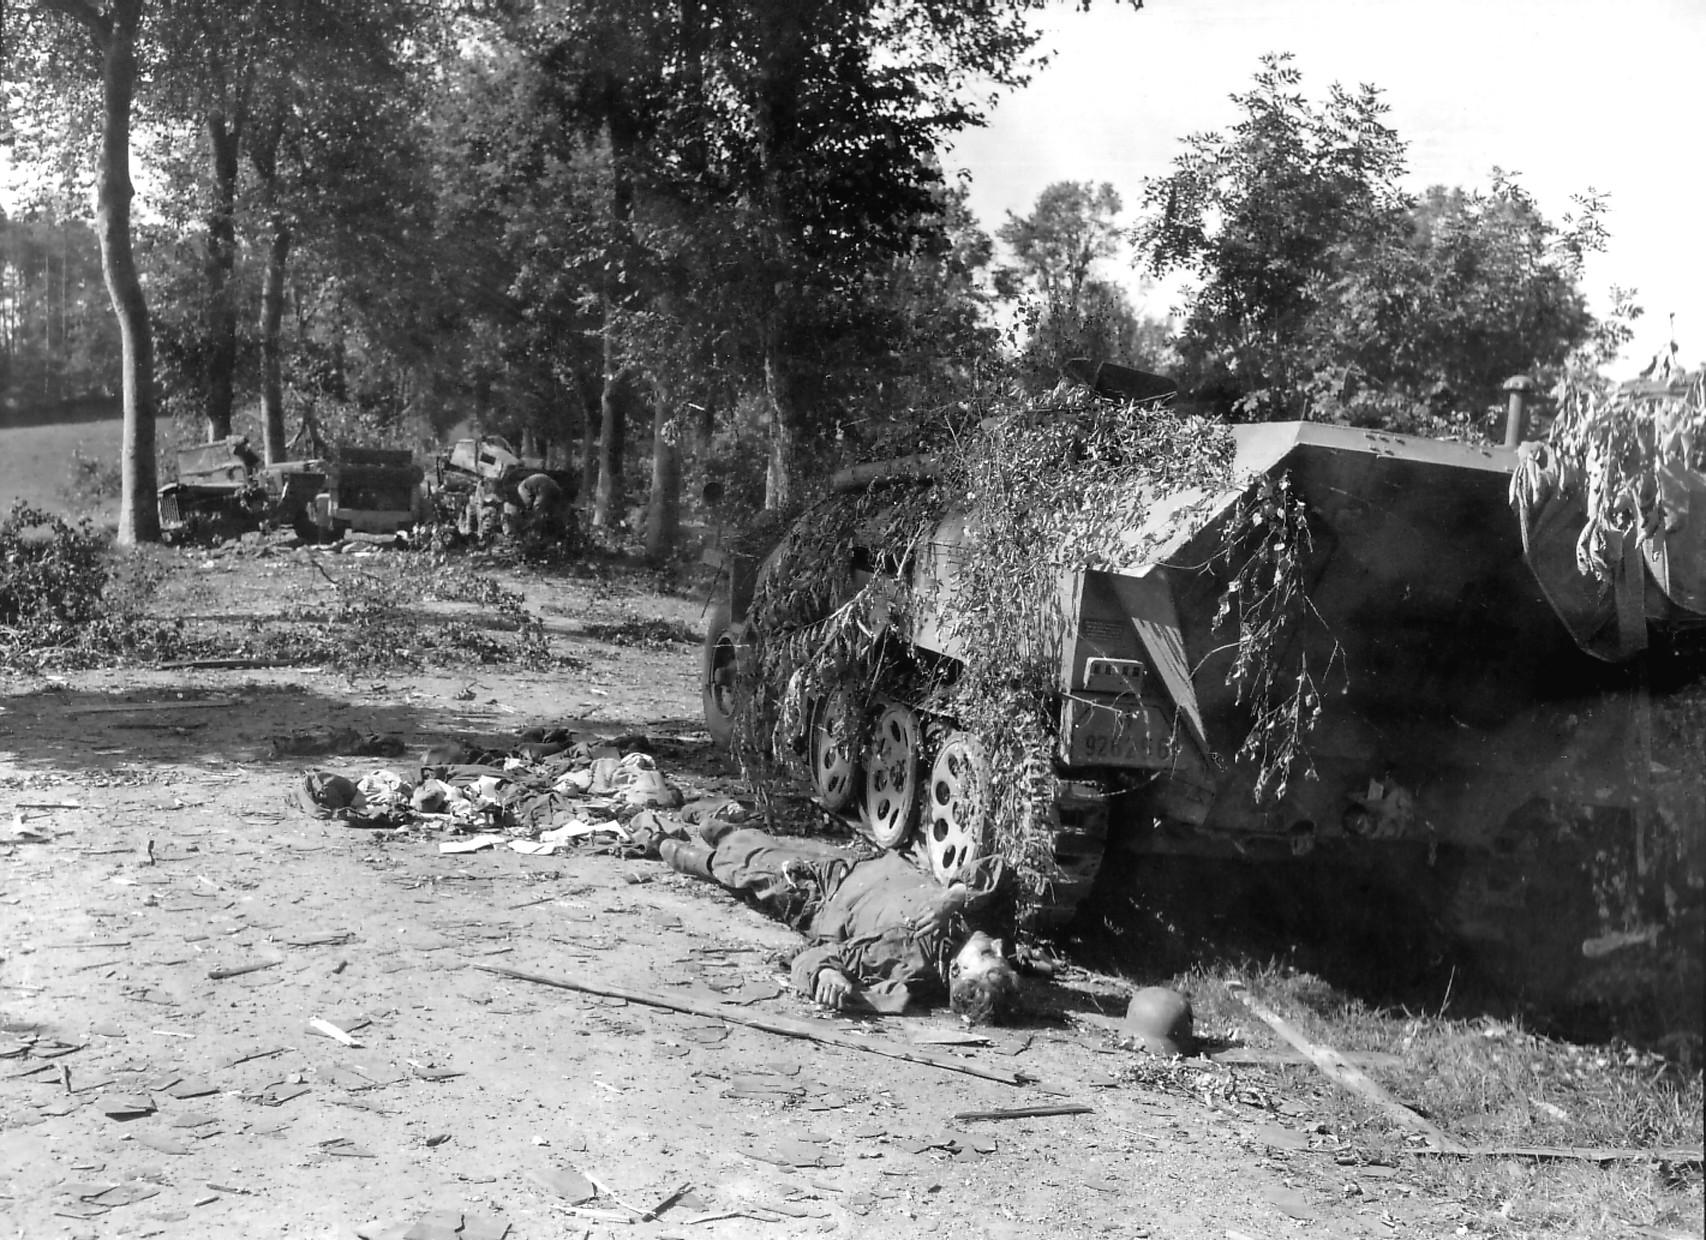 SdKfz 251 Battle of Mortain